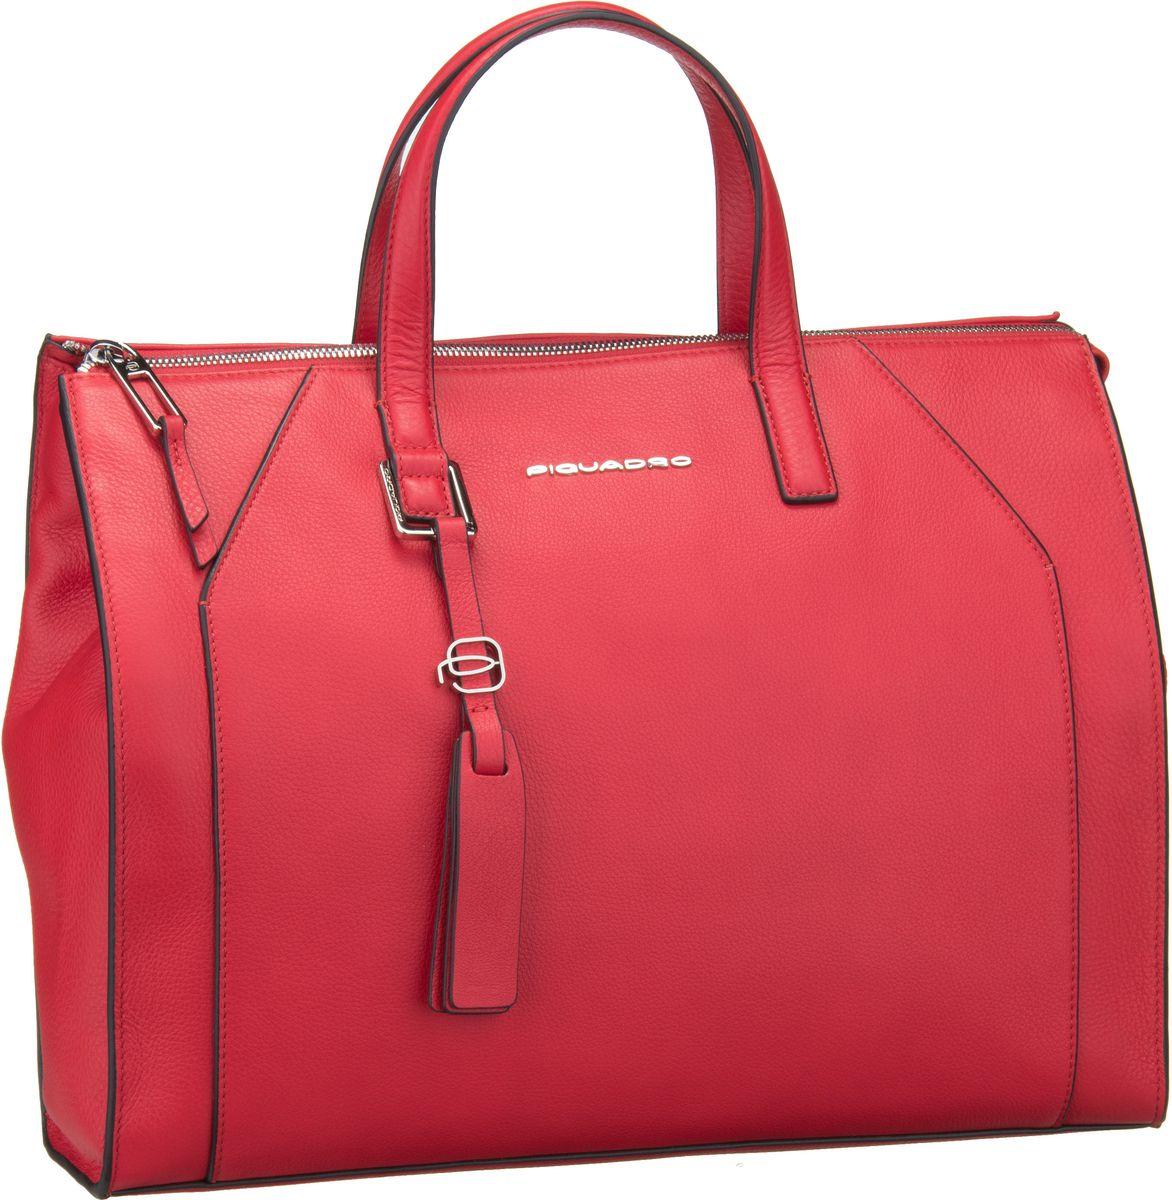 Handtasche Muse 4325 Rosso